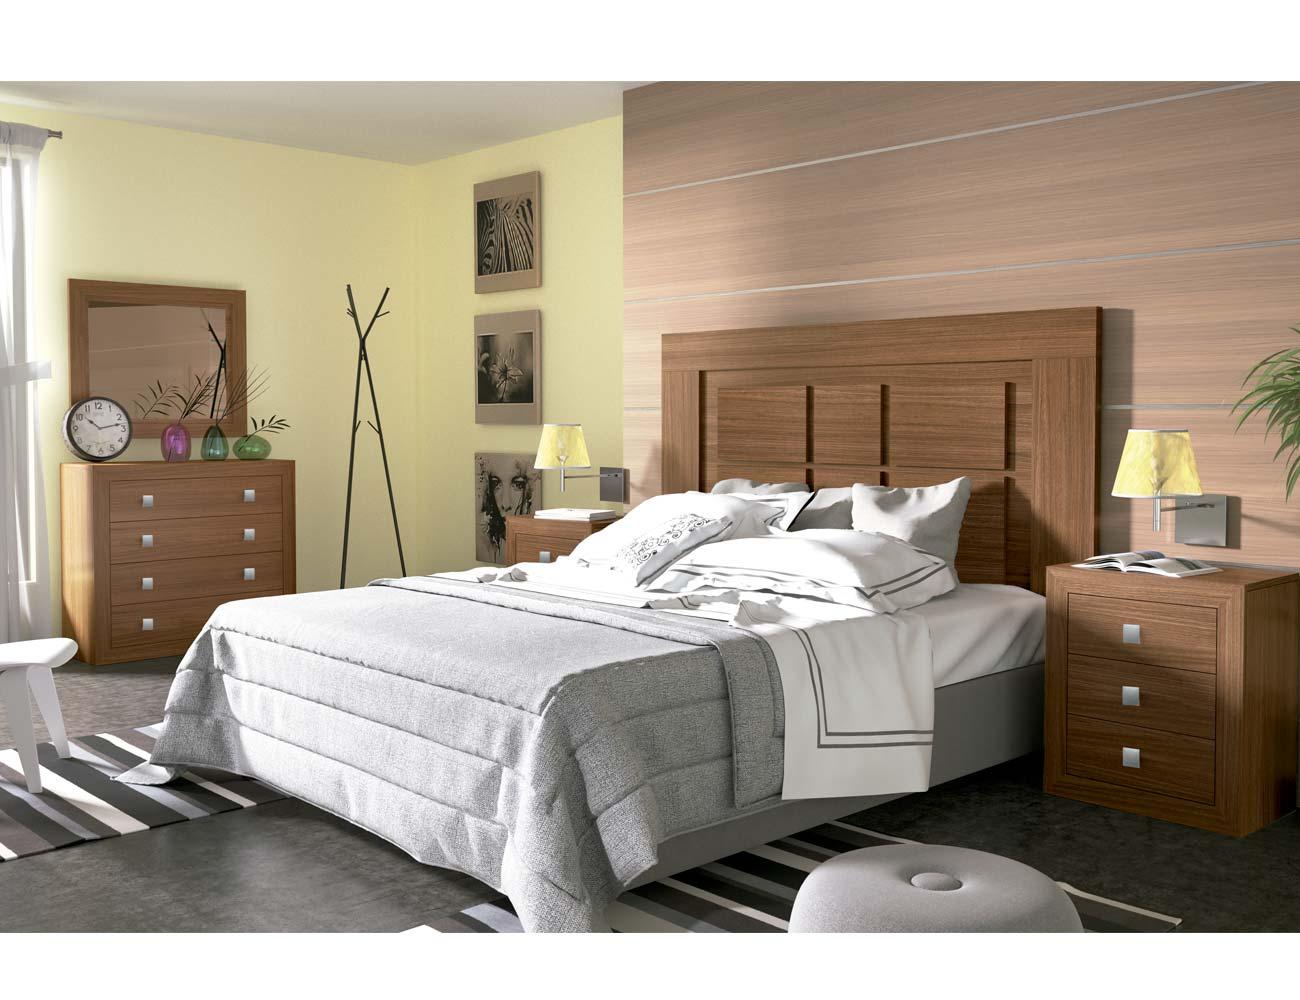 Dormitorio matrimonio moderno 09 nogal